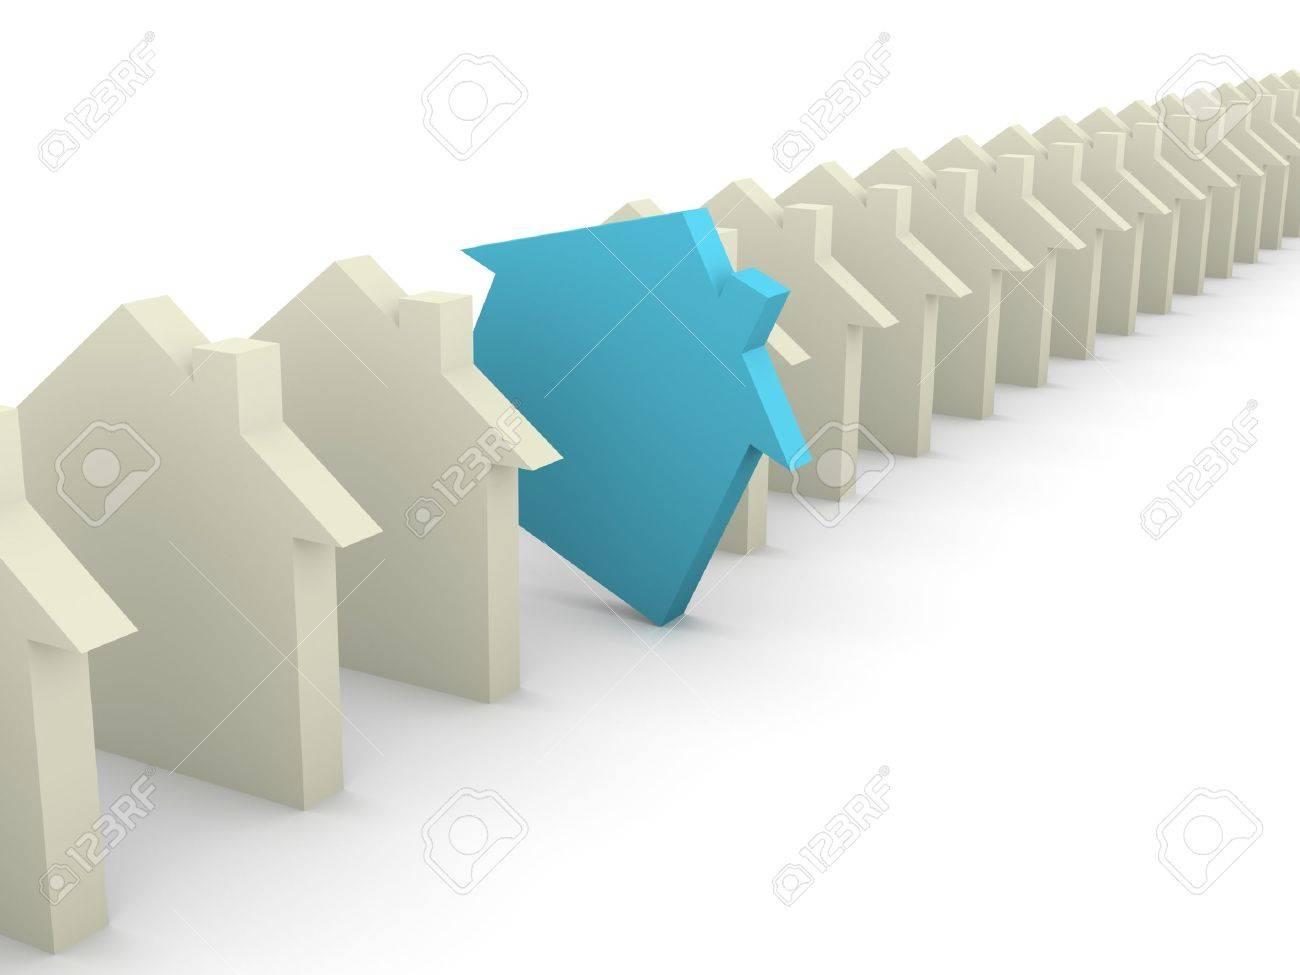 Choosing house concept Stock Photo - 15278119